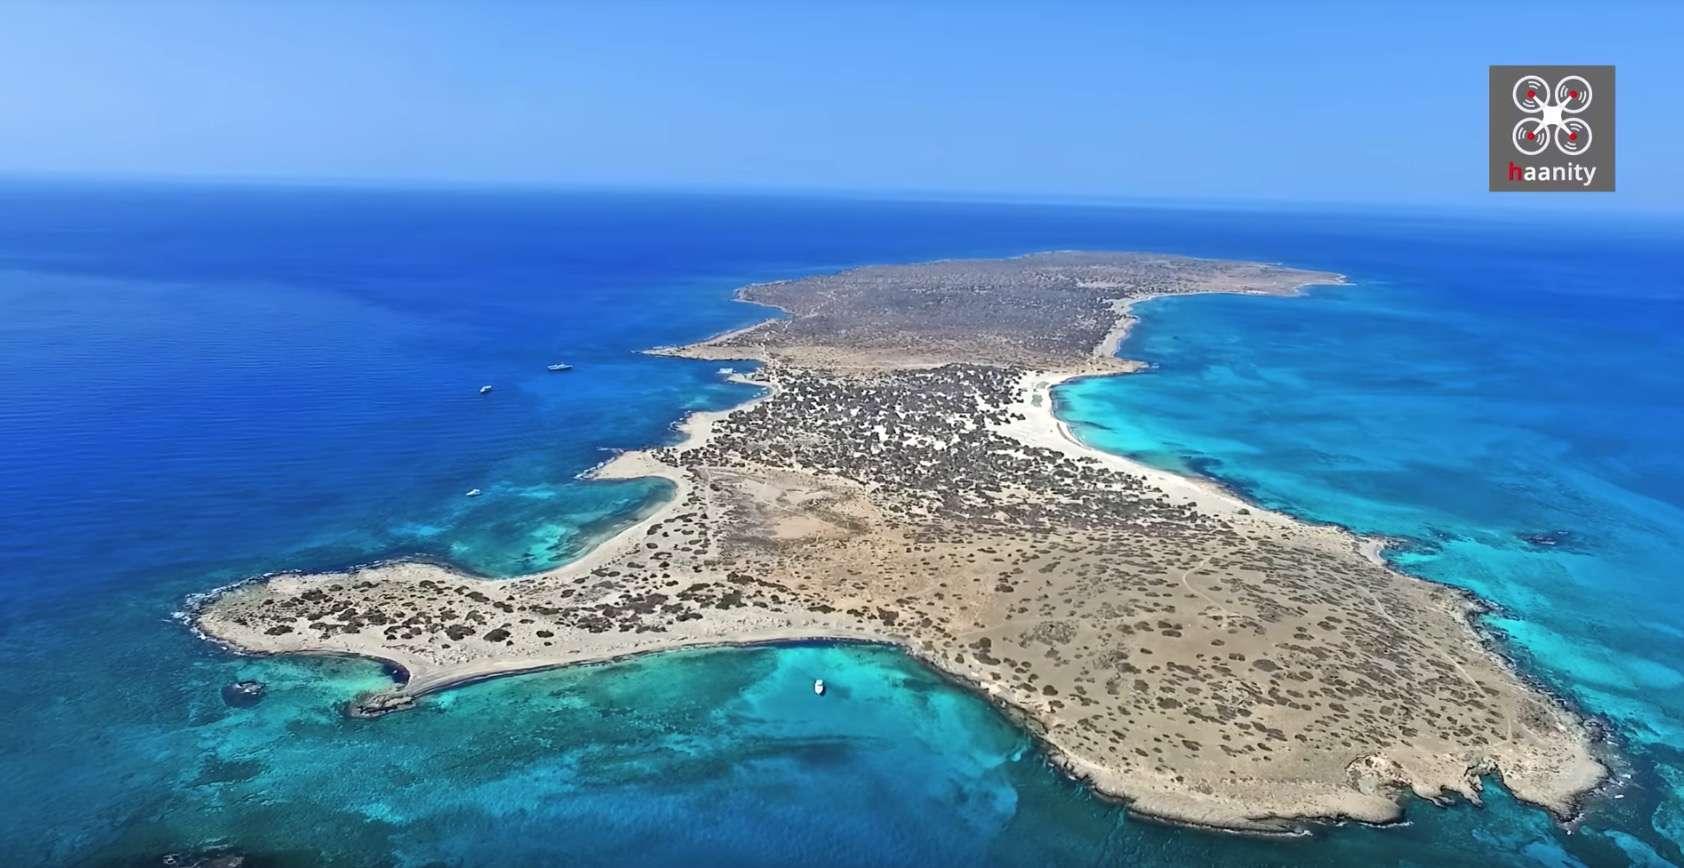 Tο μικροσκοπικό, γραφικό ελληνικό νησάκι με το κεδρόδασος, τα αμέτρητα κοχύλια, τα γαλάζια νερά και τις απέραντες αμμουδιές